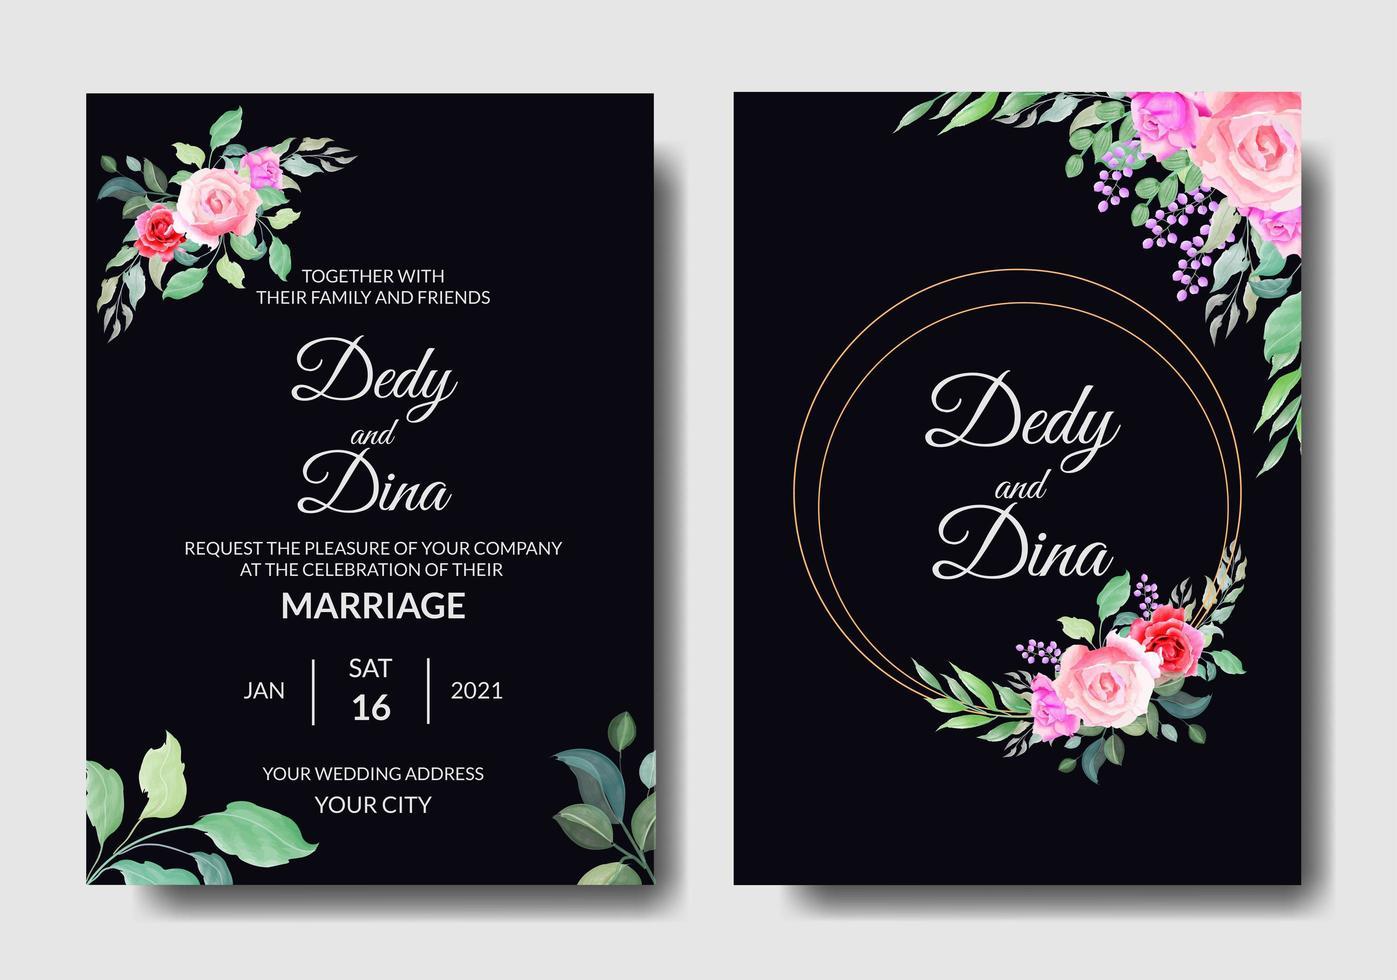 invitation de mariage aquarelle vecteur